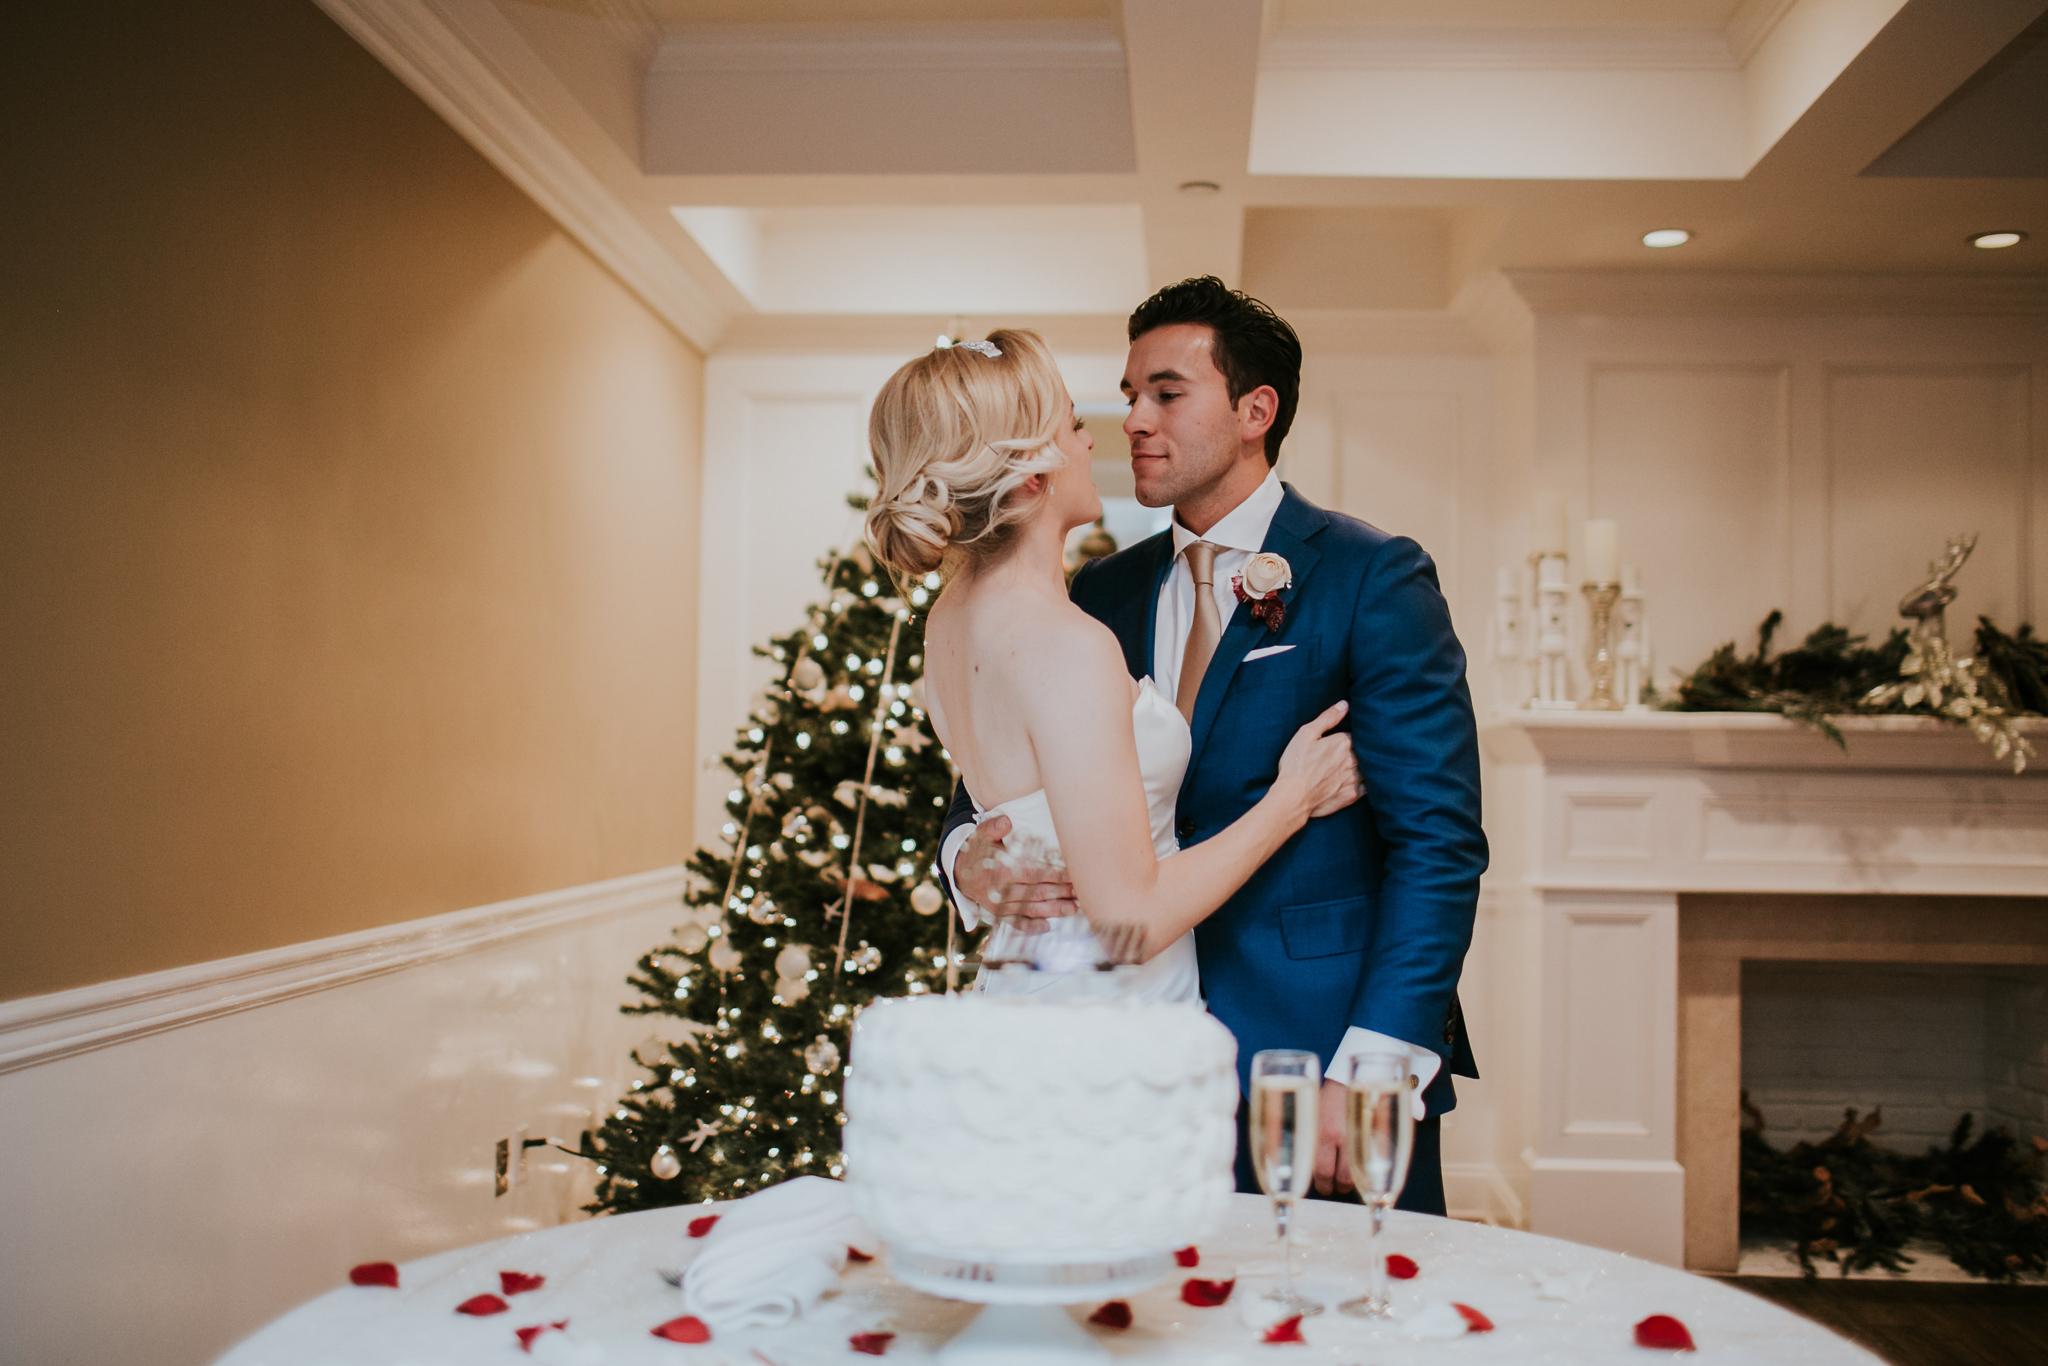 20151230_hussem_wedding_1054_web.jpg